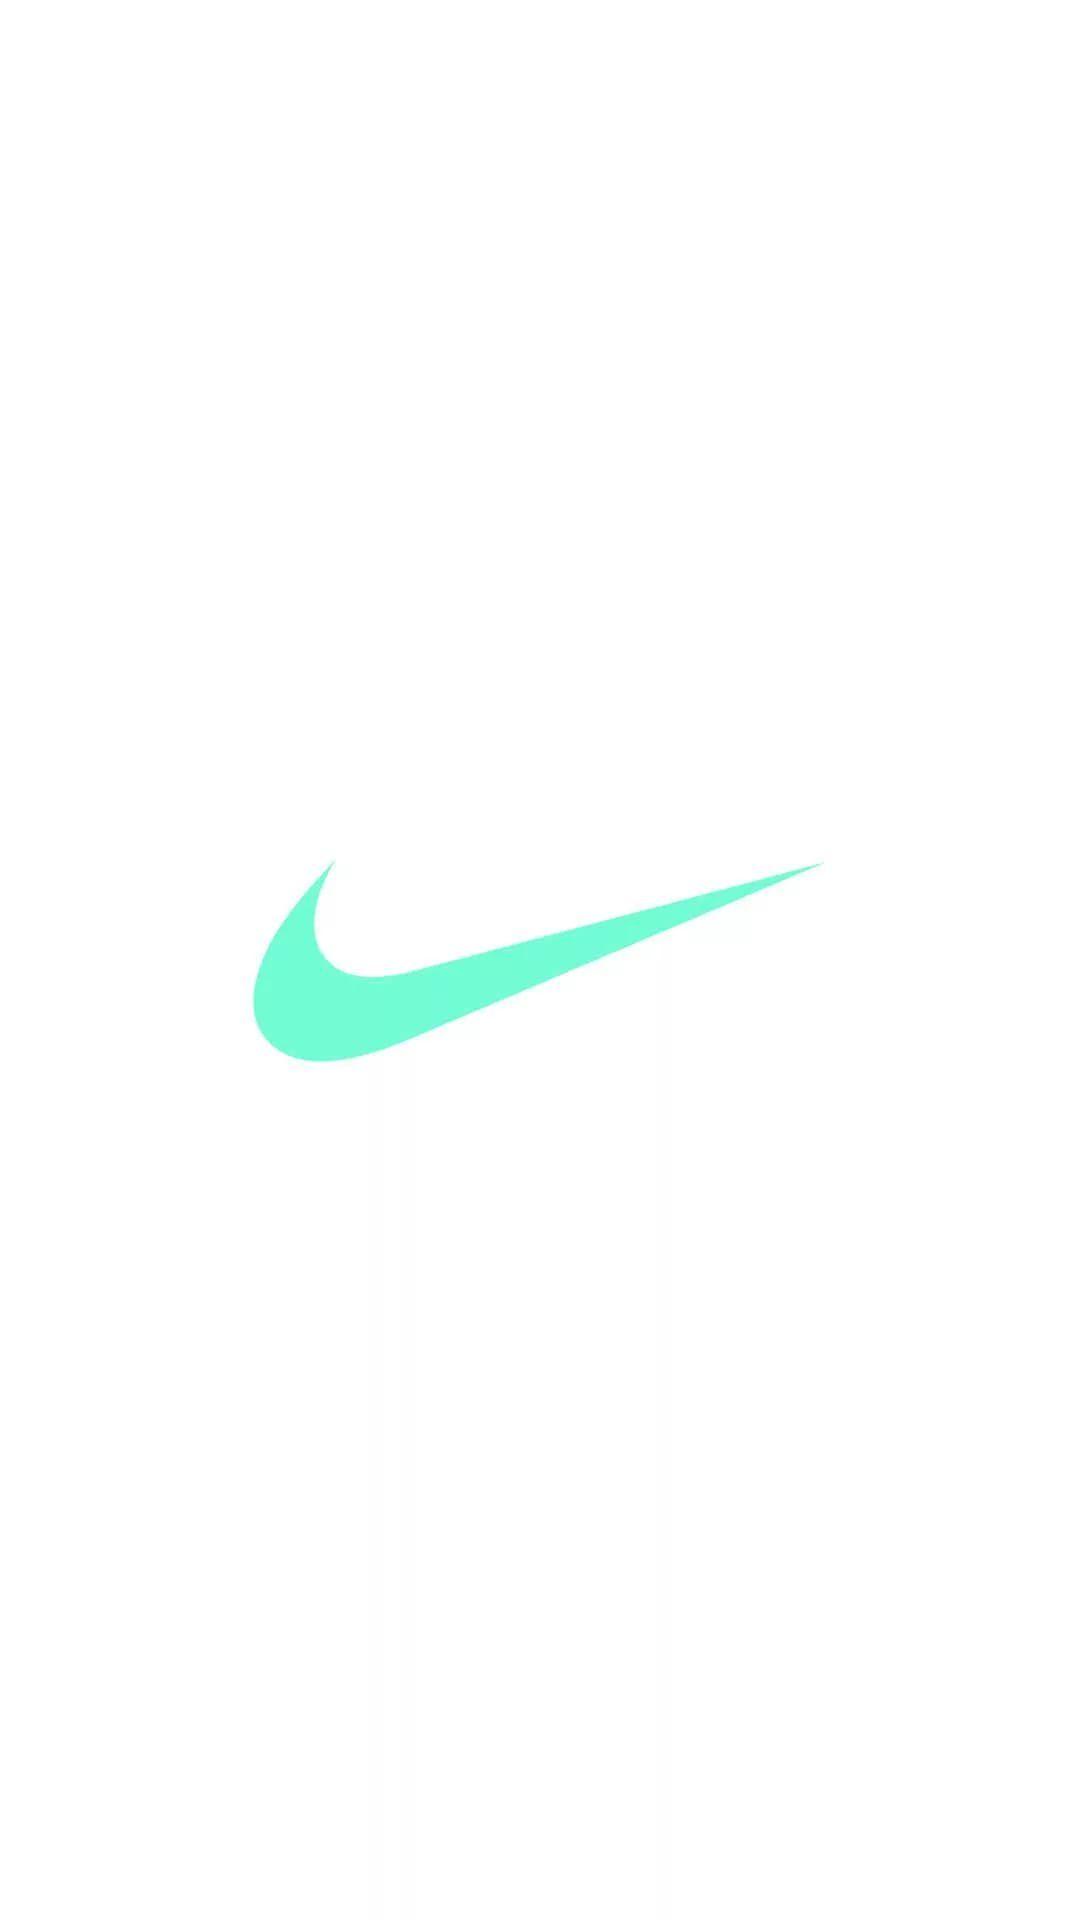 15 Nike Iphone Wallpapers Wallpaperboat